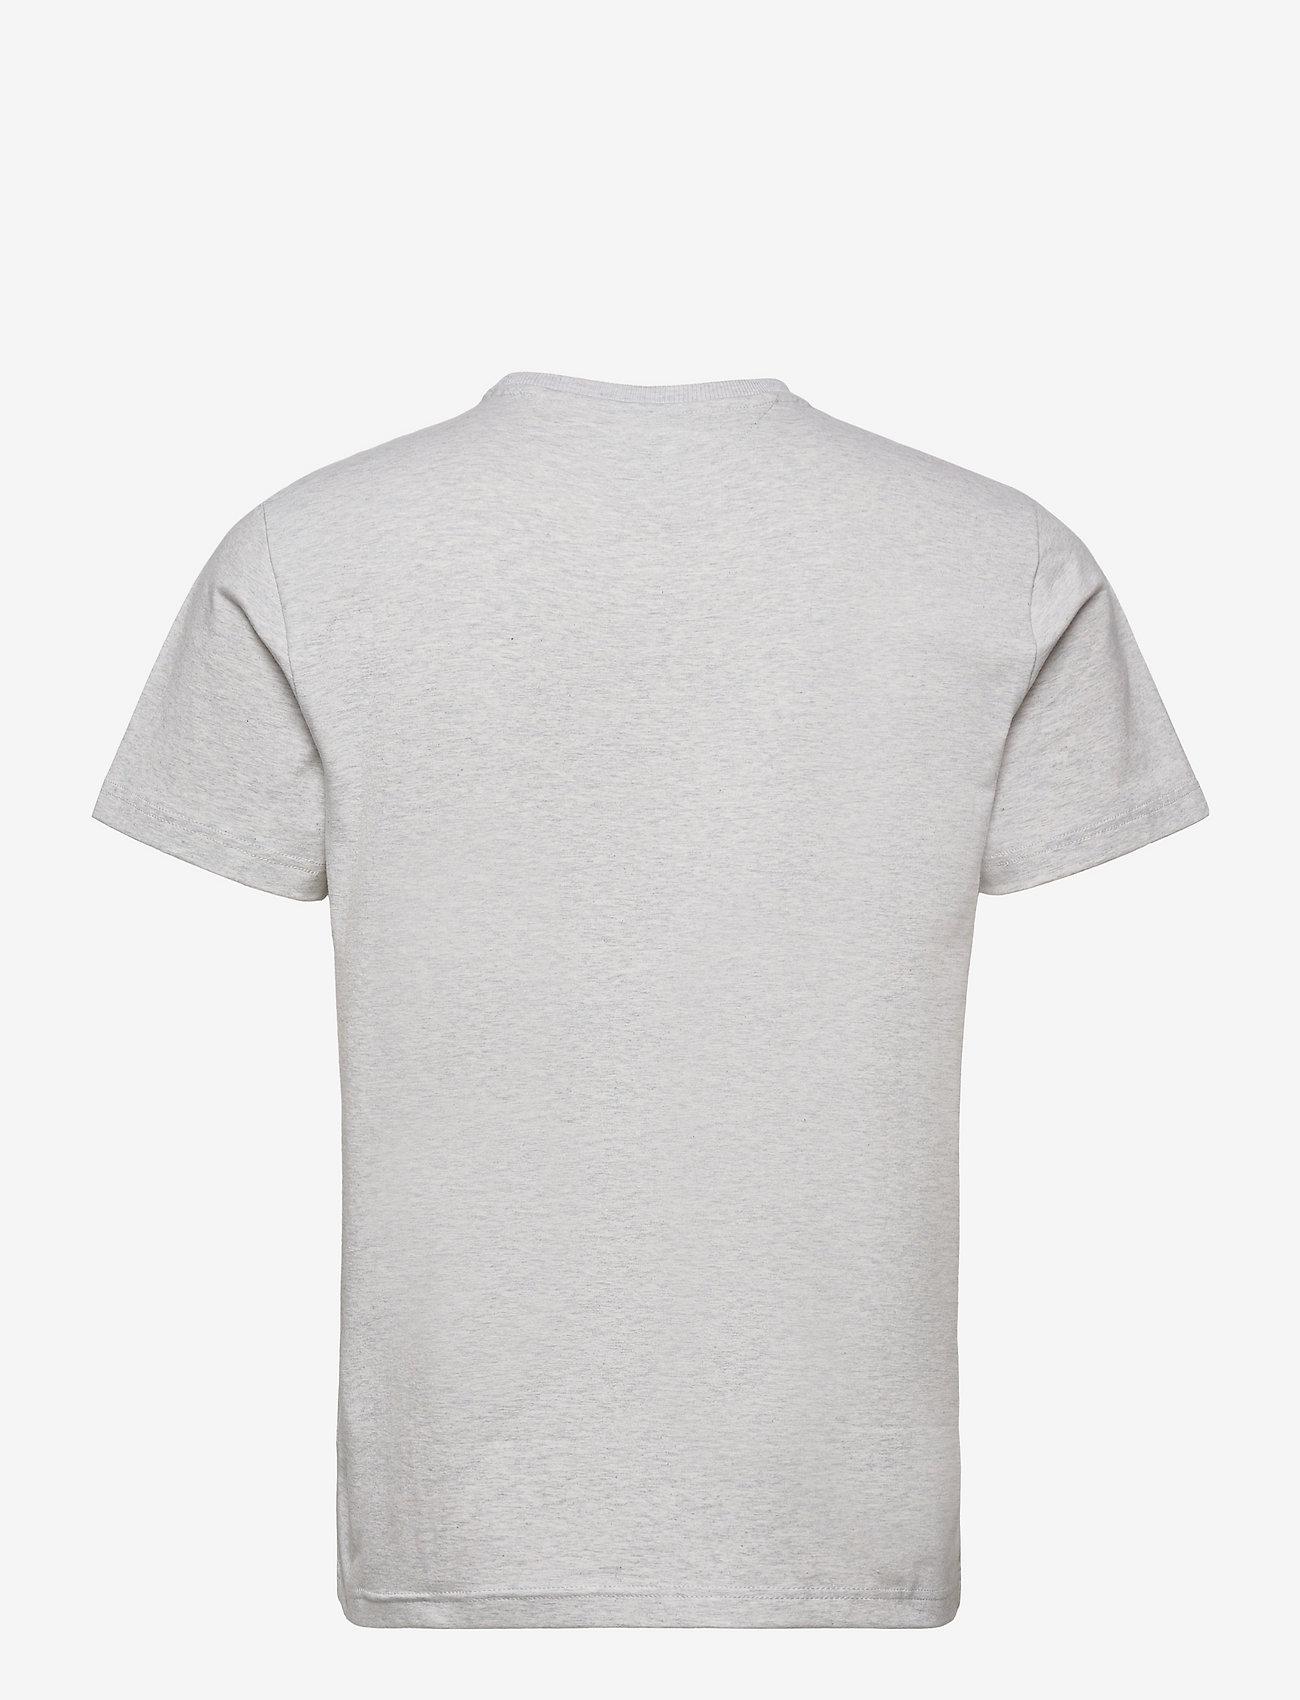 Tommy Jeans - TJM COLOR CORP LOGO TEE - kortärmade t-shirts - silver grey htr - 1